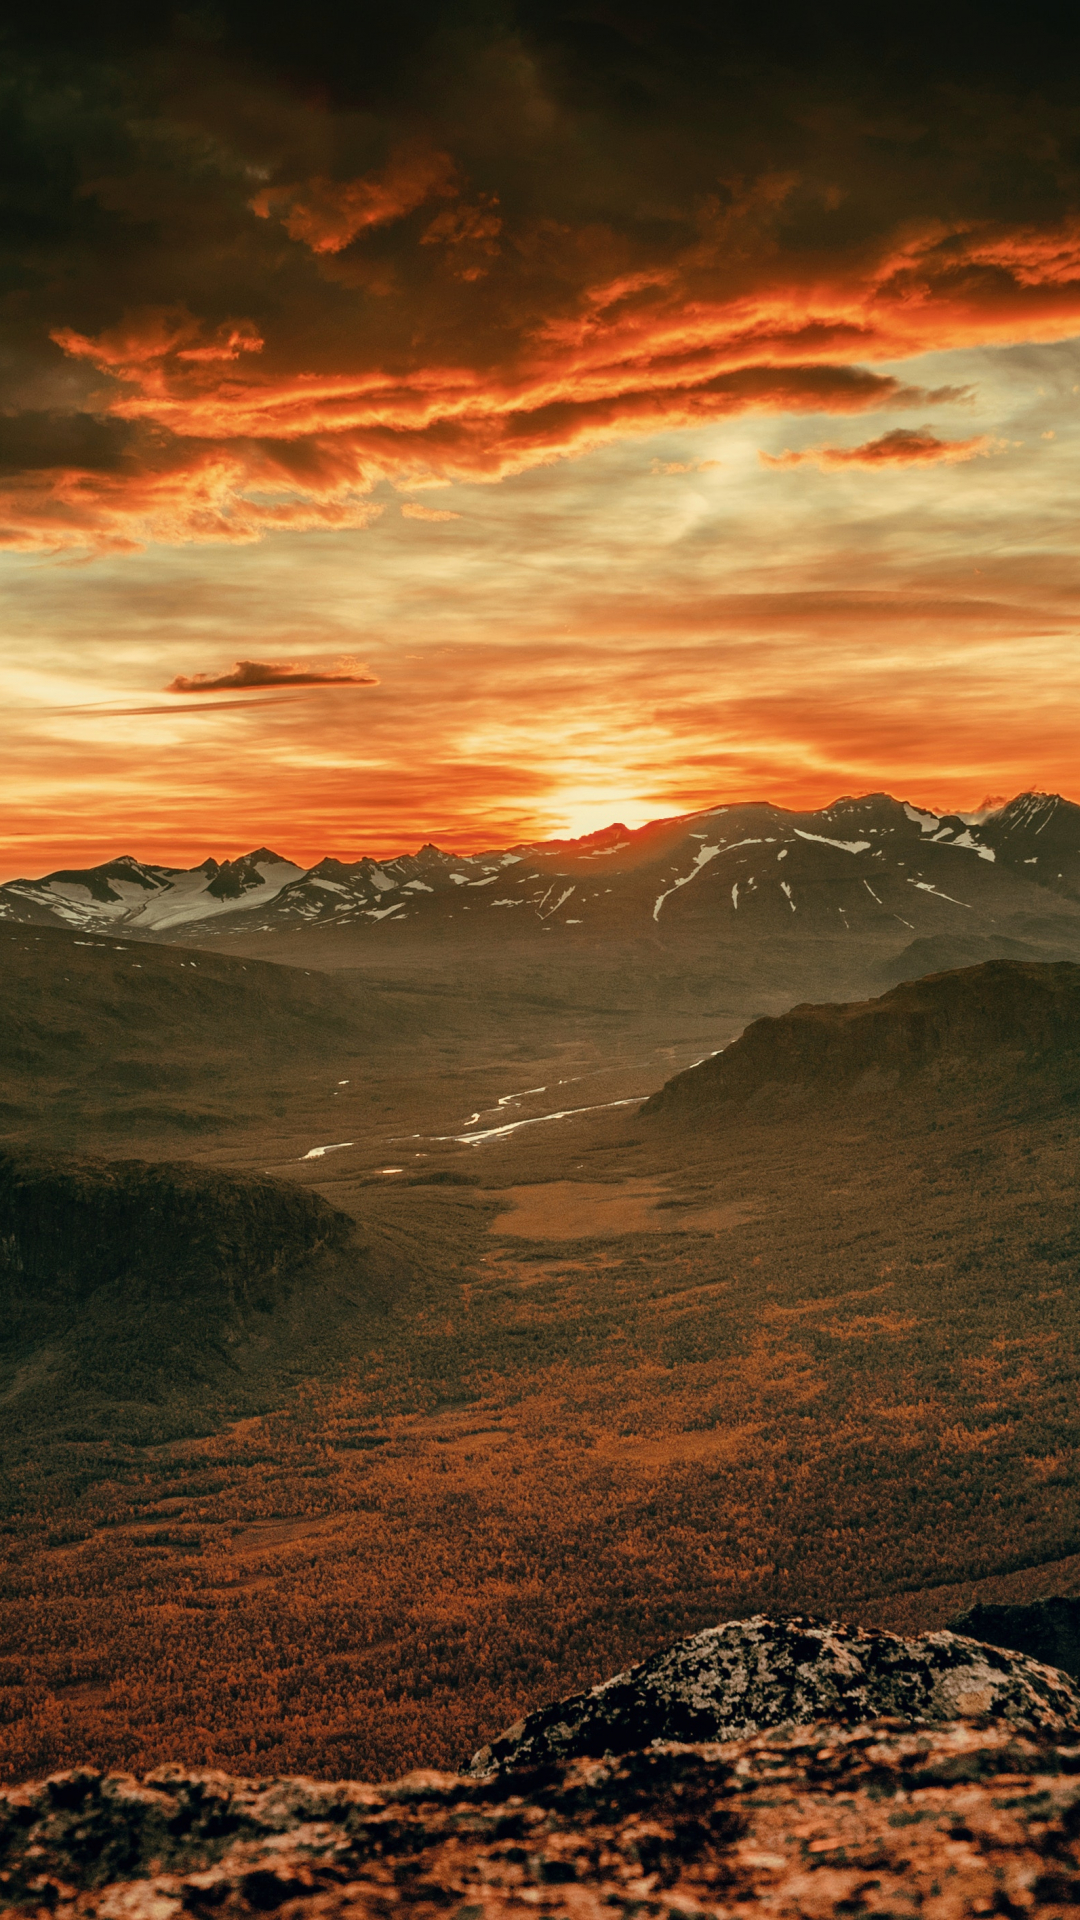 Sunset, Mountain, Cloud iPhone Wallpaper